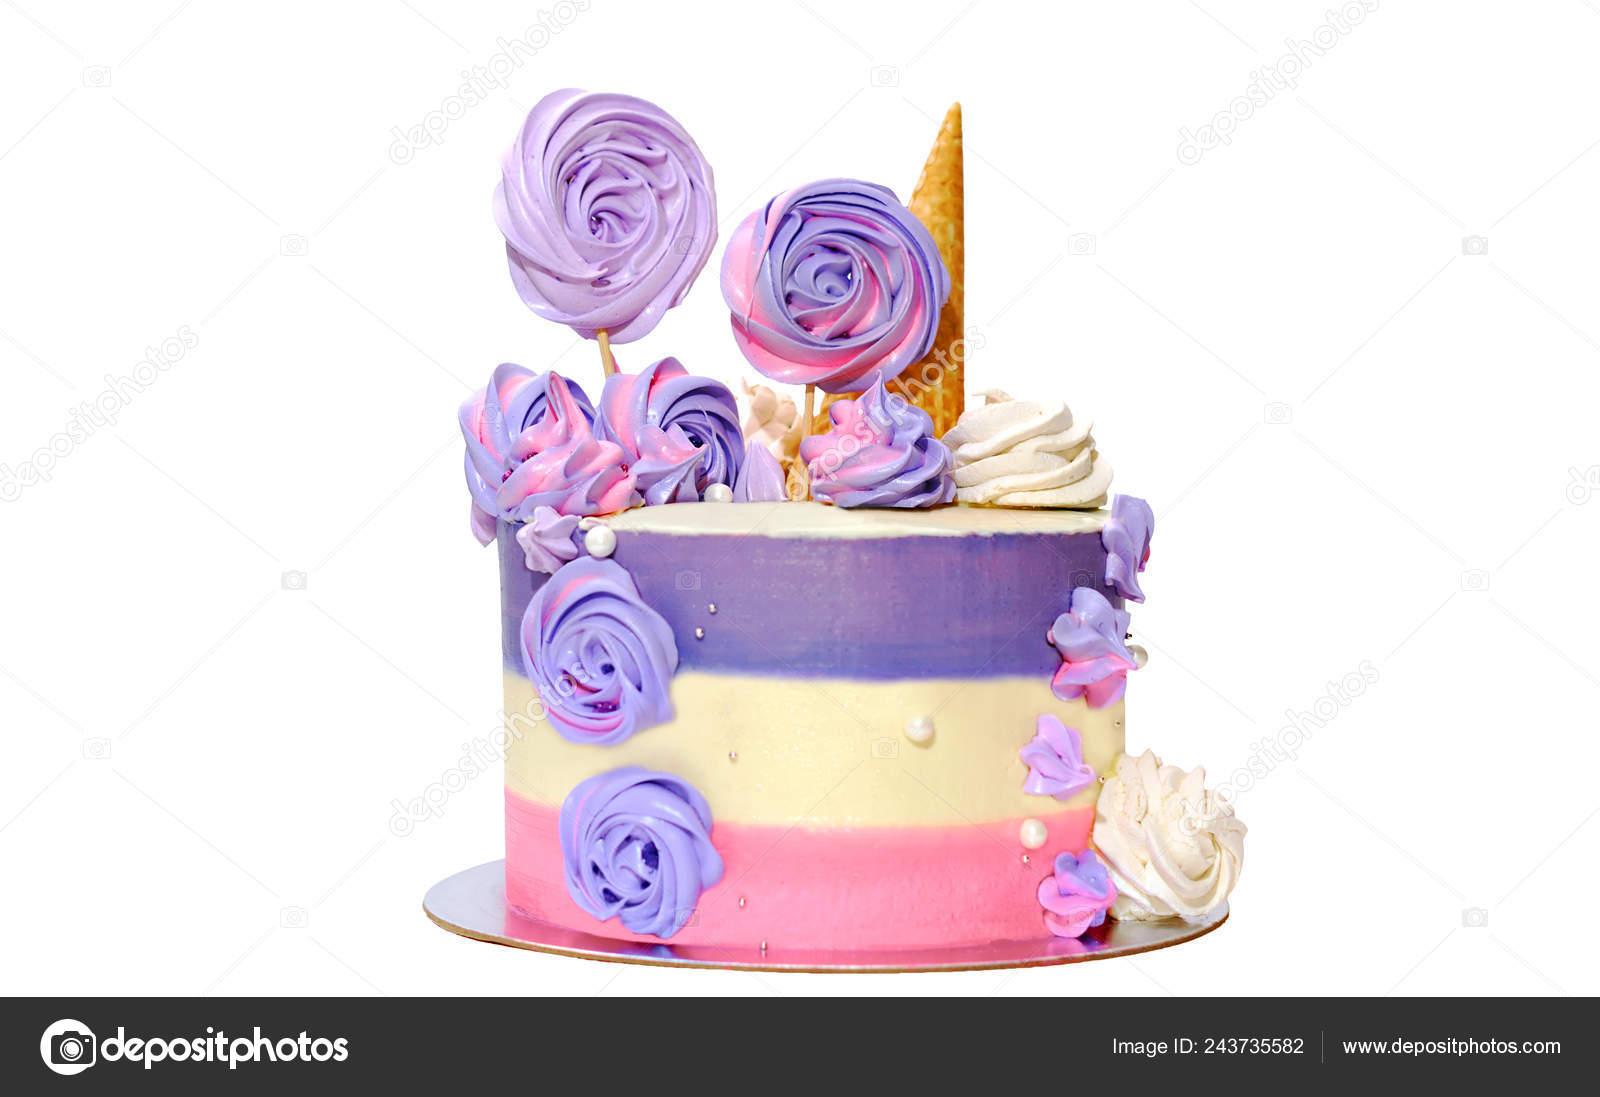 Phenomenal Pink And Purple Birthday Cake Birthday Cake Colored Stripes Pink Birthday Cards Printable Opercafe Filternl